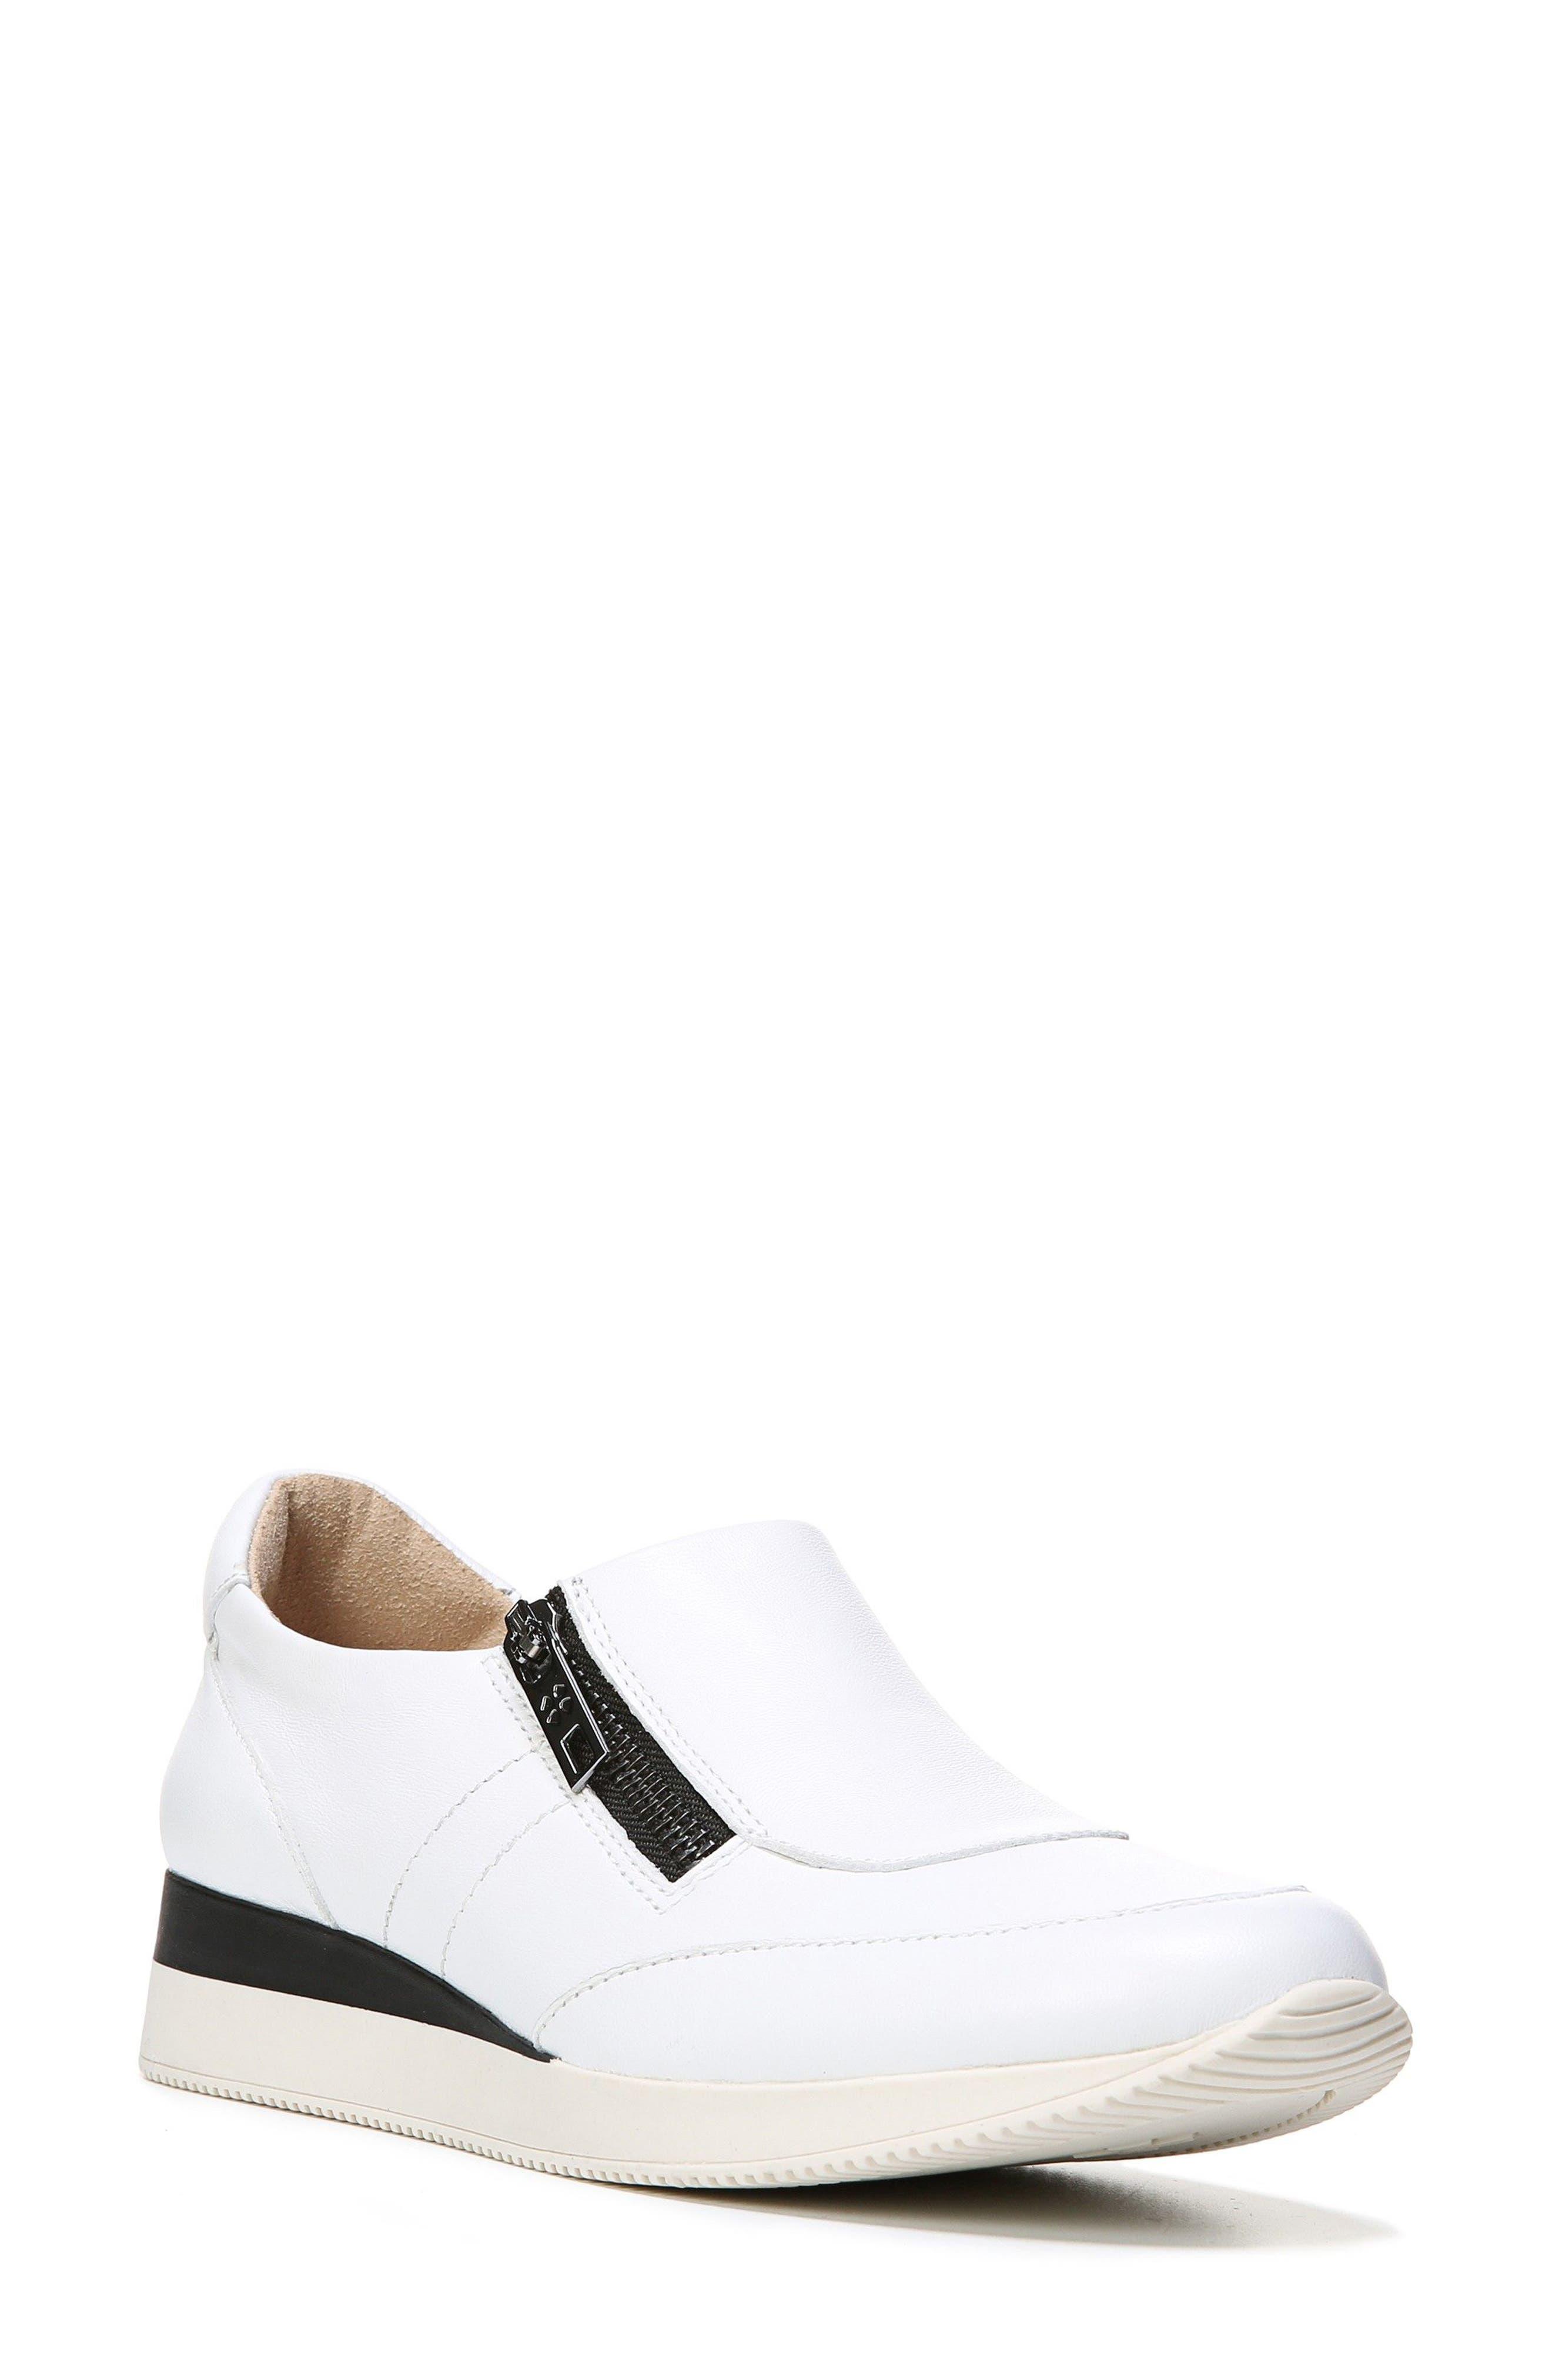 Alternate Image 1 Selected - Naturalizer Jetty Sneaker (Women)